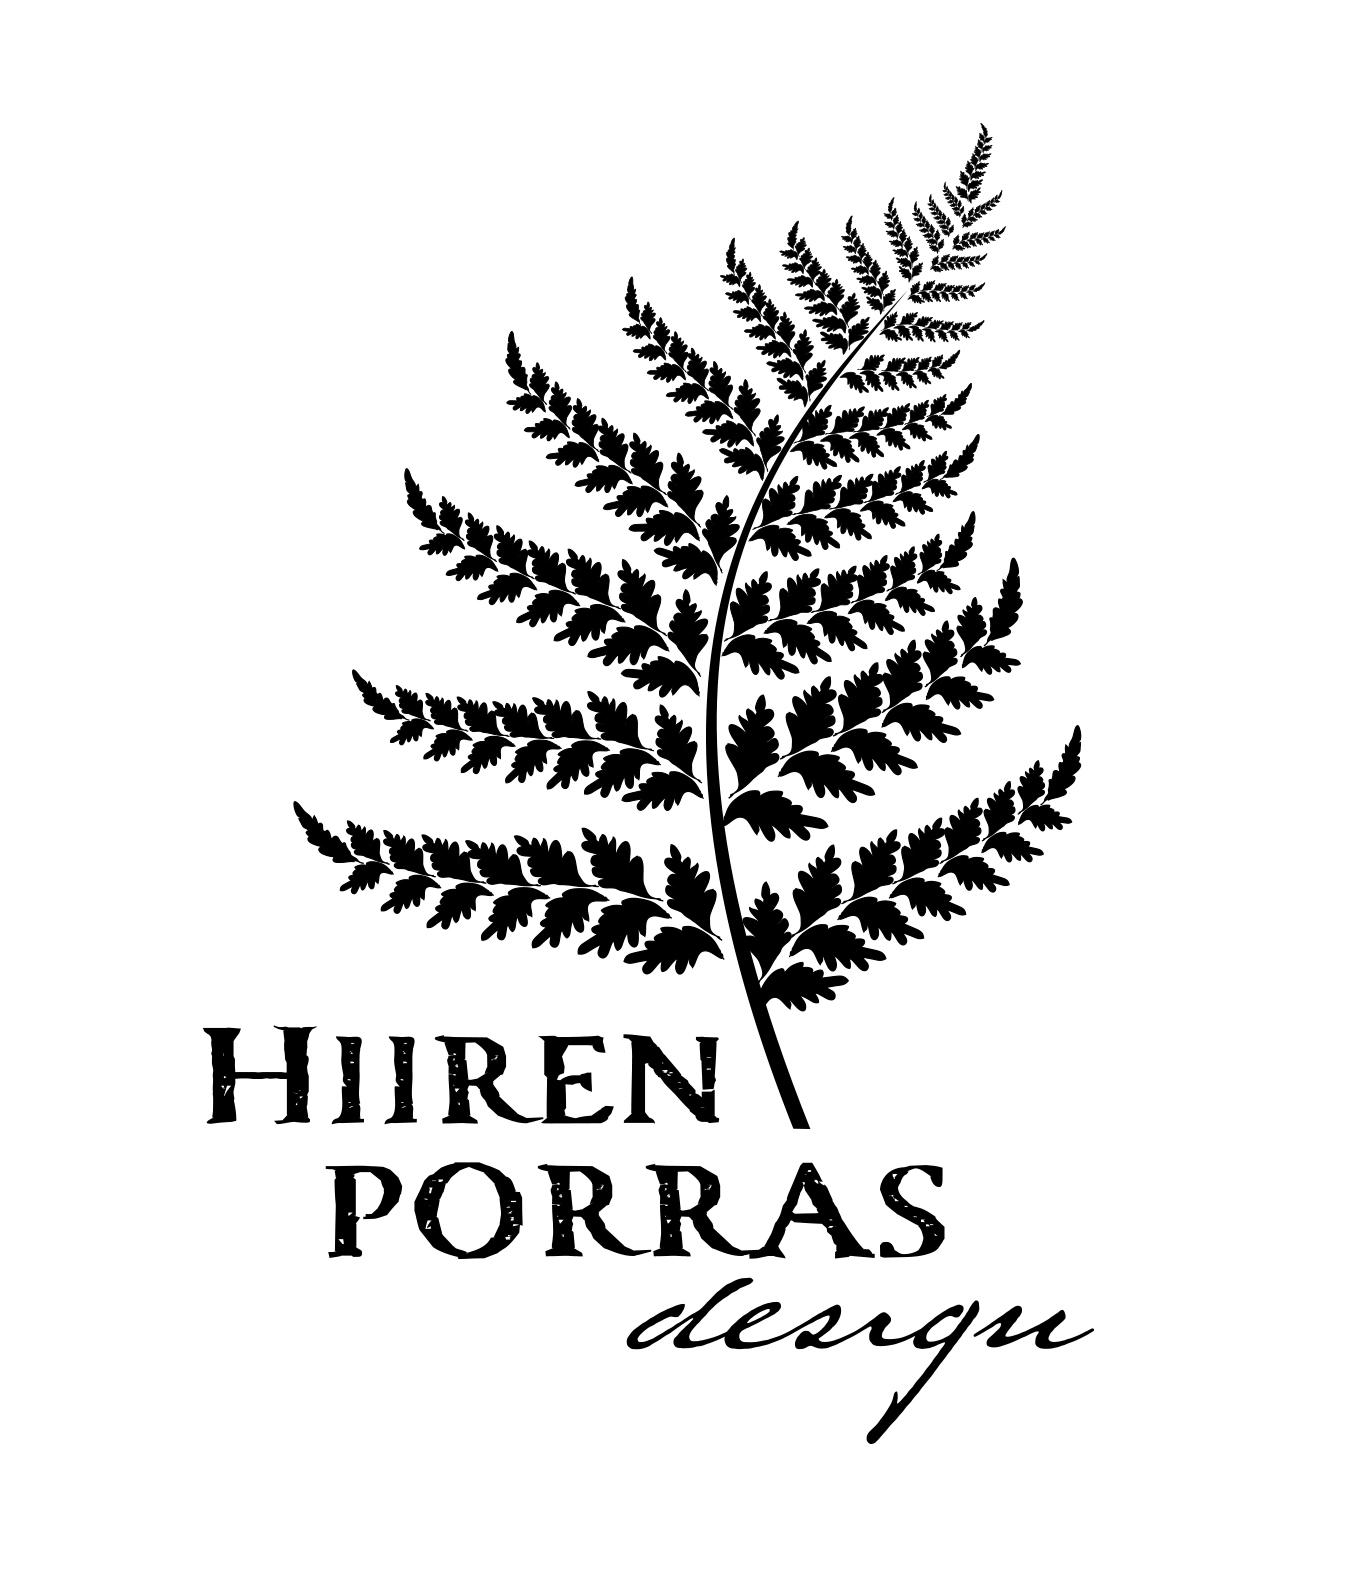 Hiirenporras Design